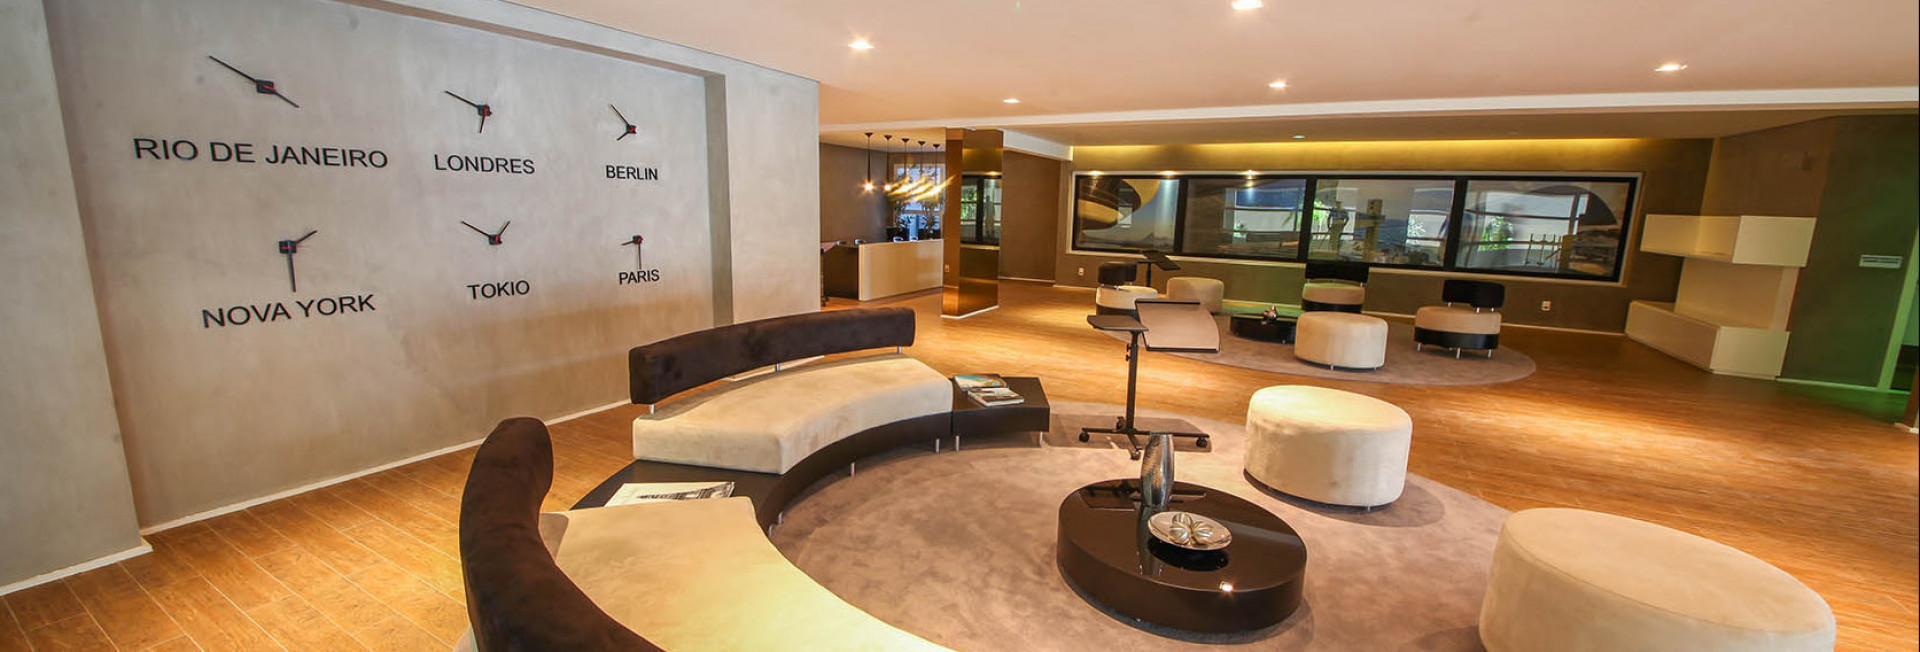 CGH Aeroporto Offices